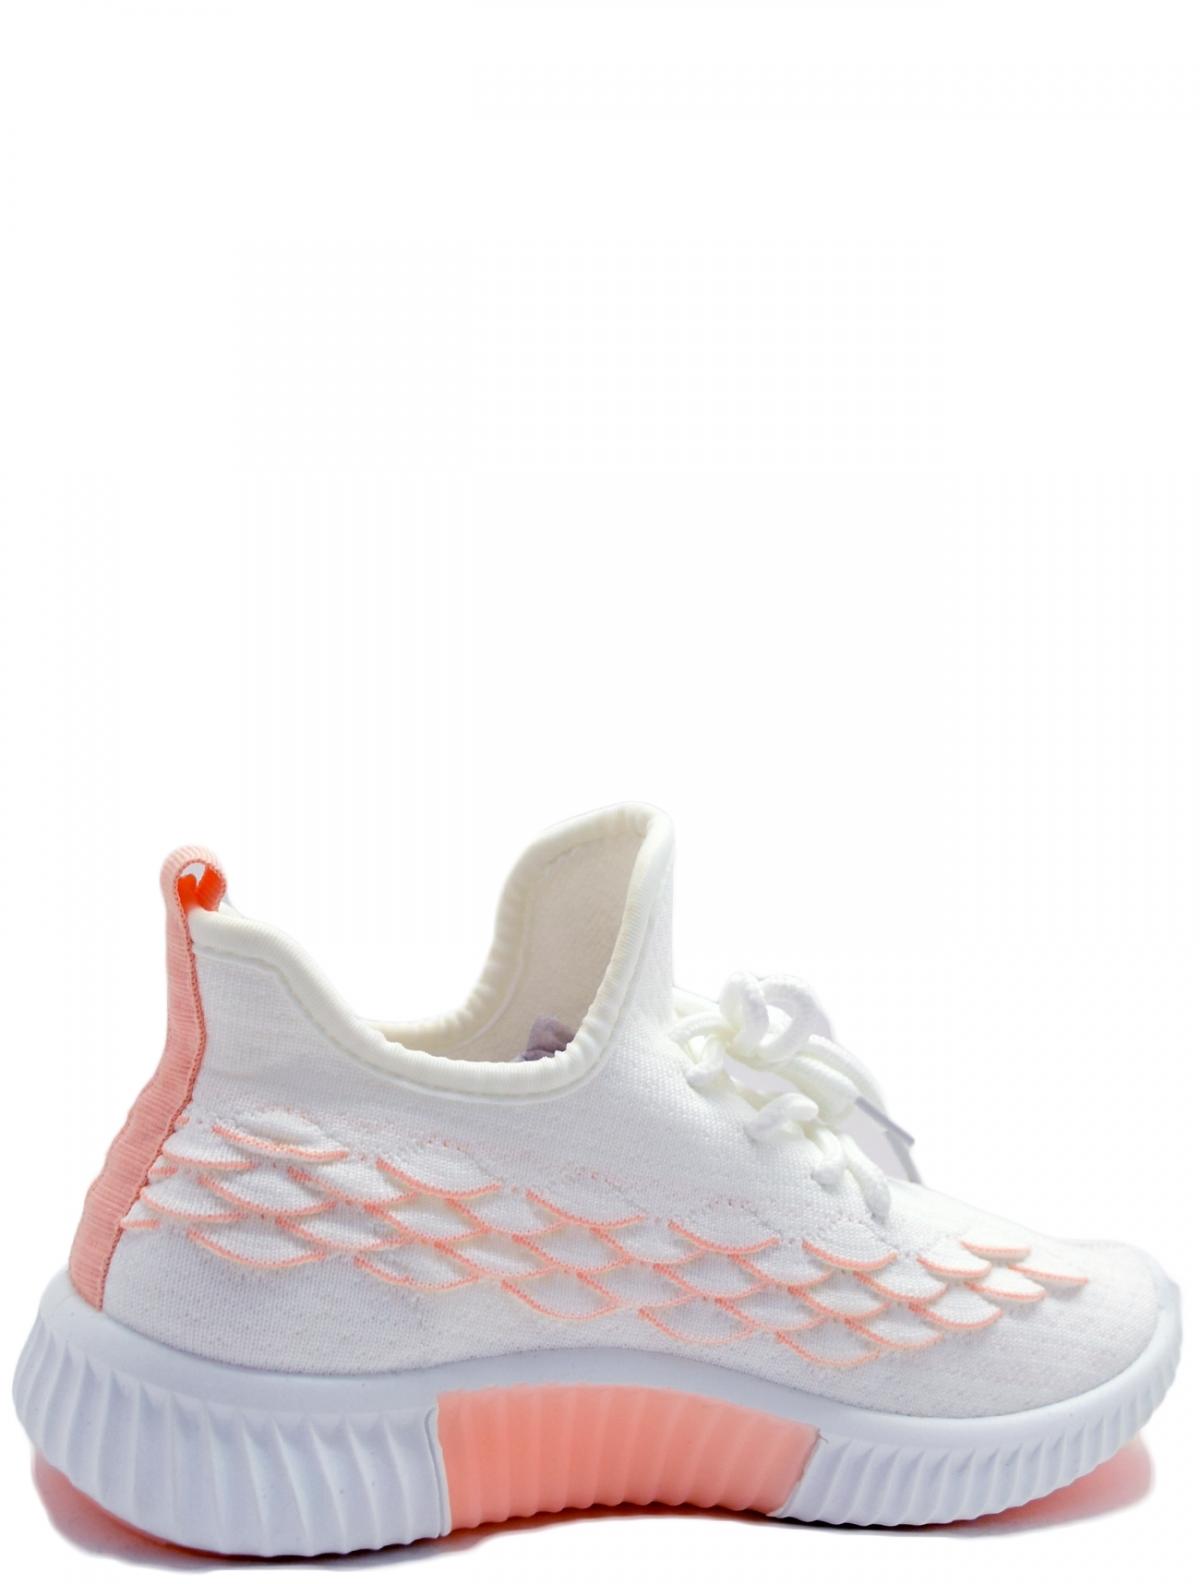 Trien OB557-7 женские кроссовки